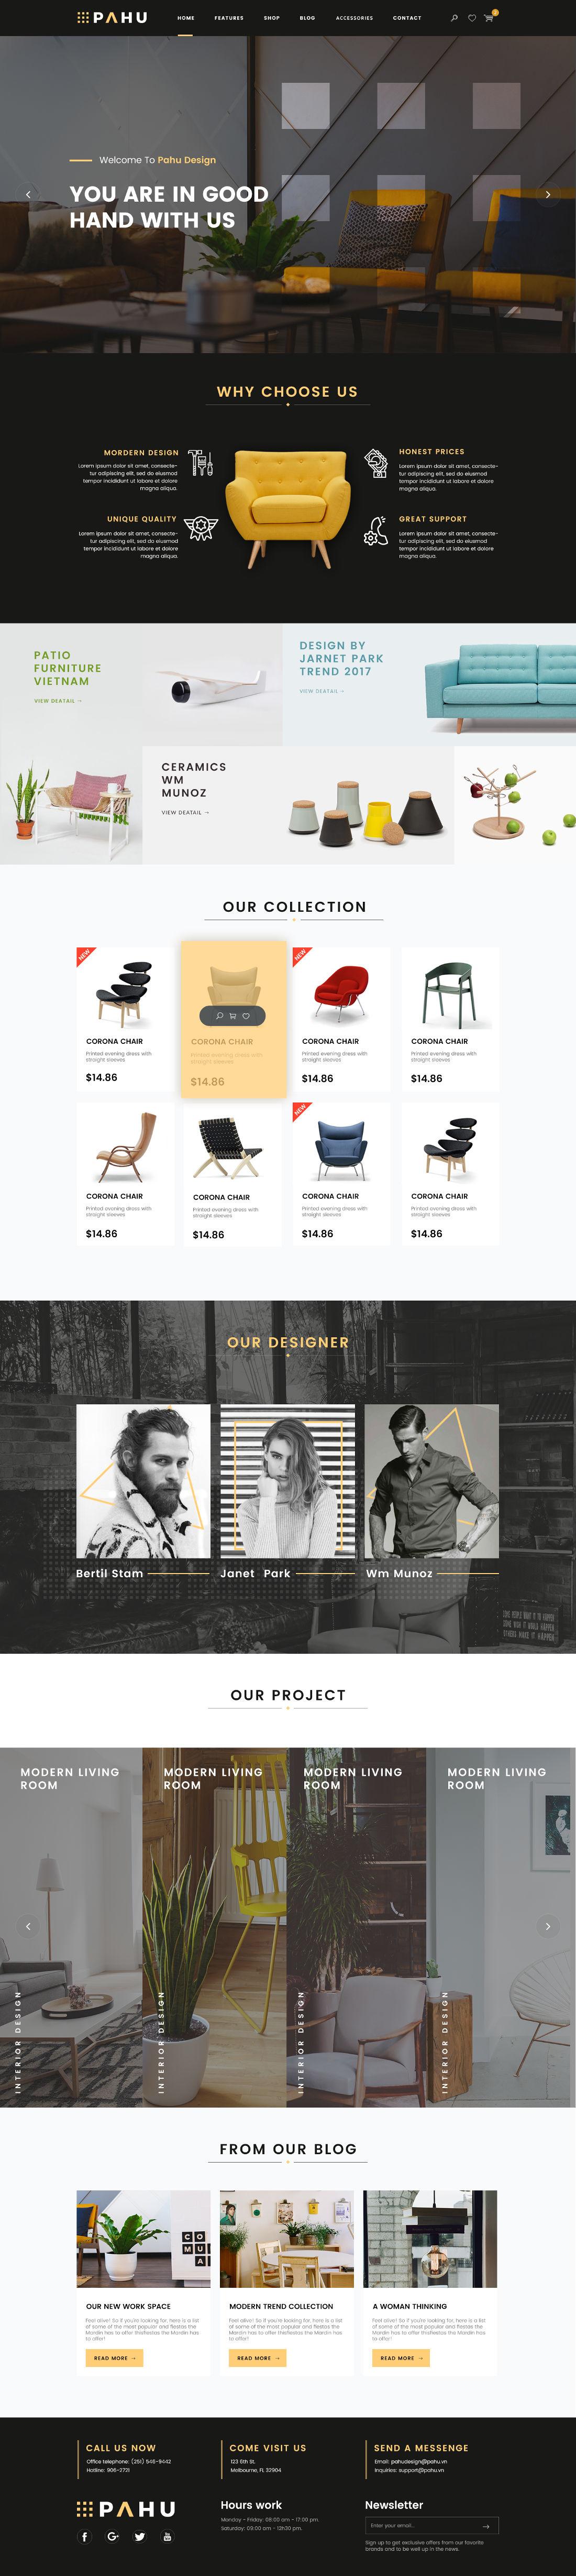 Free PAHU Interior Design Website Template